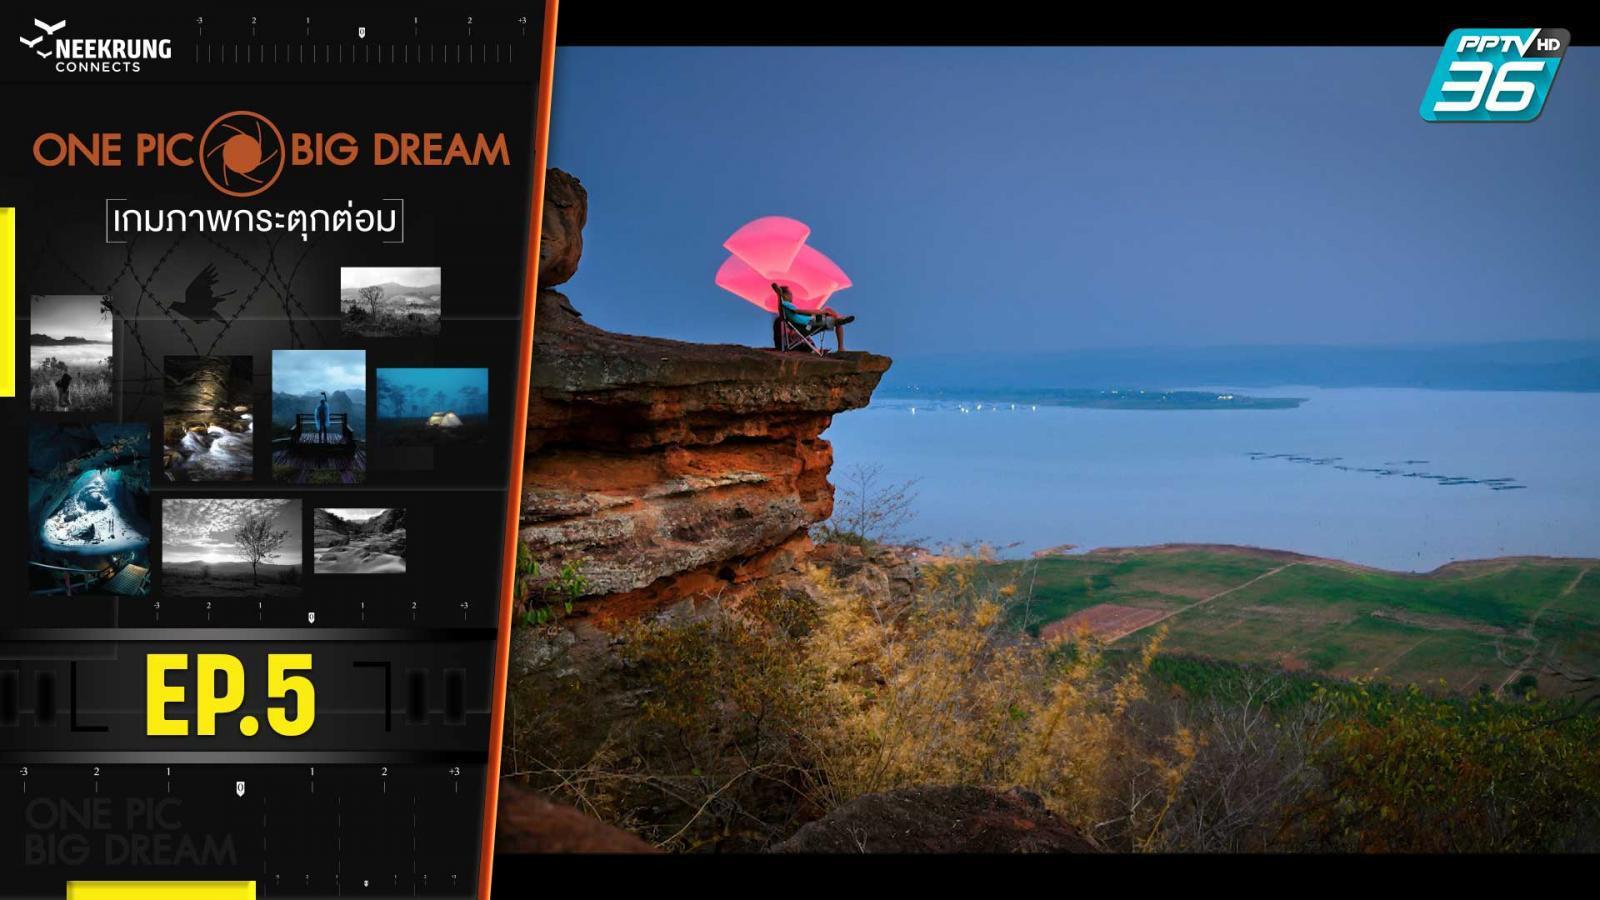 ONE PIC BIG DREAM เกมภาพกระตุกต่อม EP.5 | 29 ก.ค. 63 | PPTV HD 36